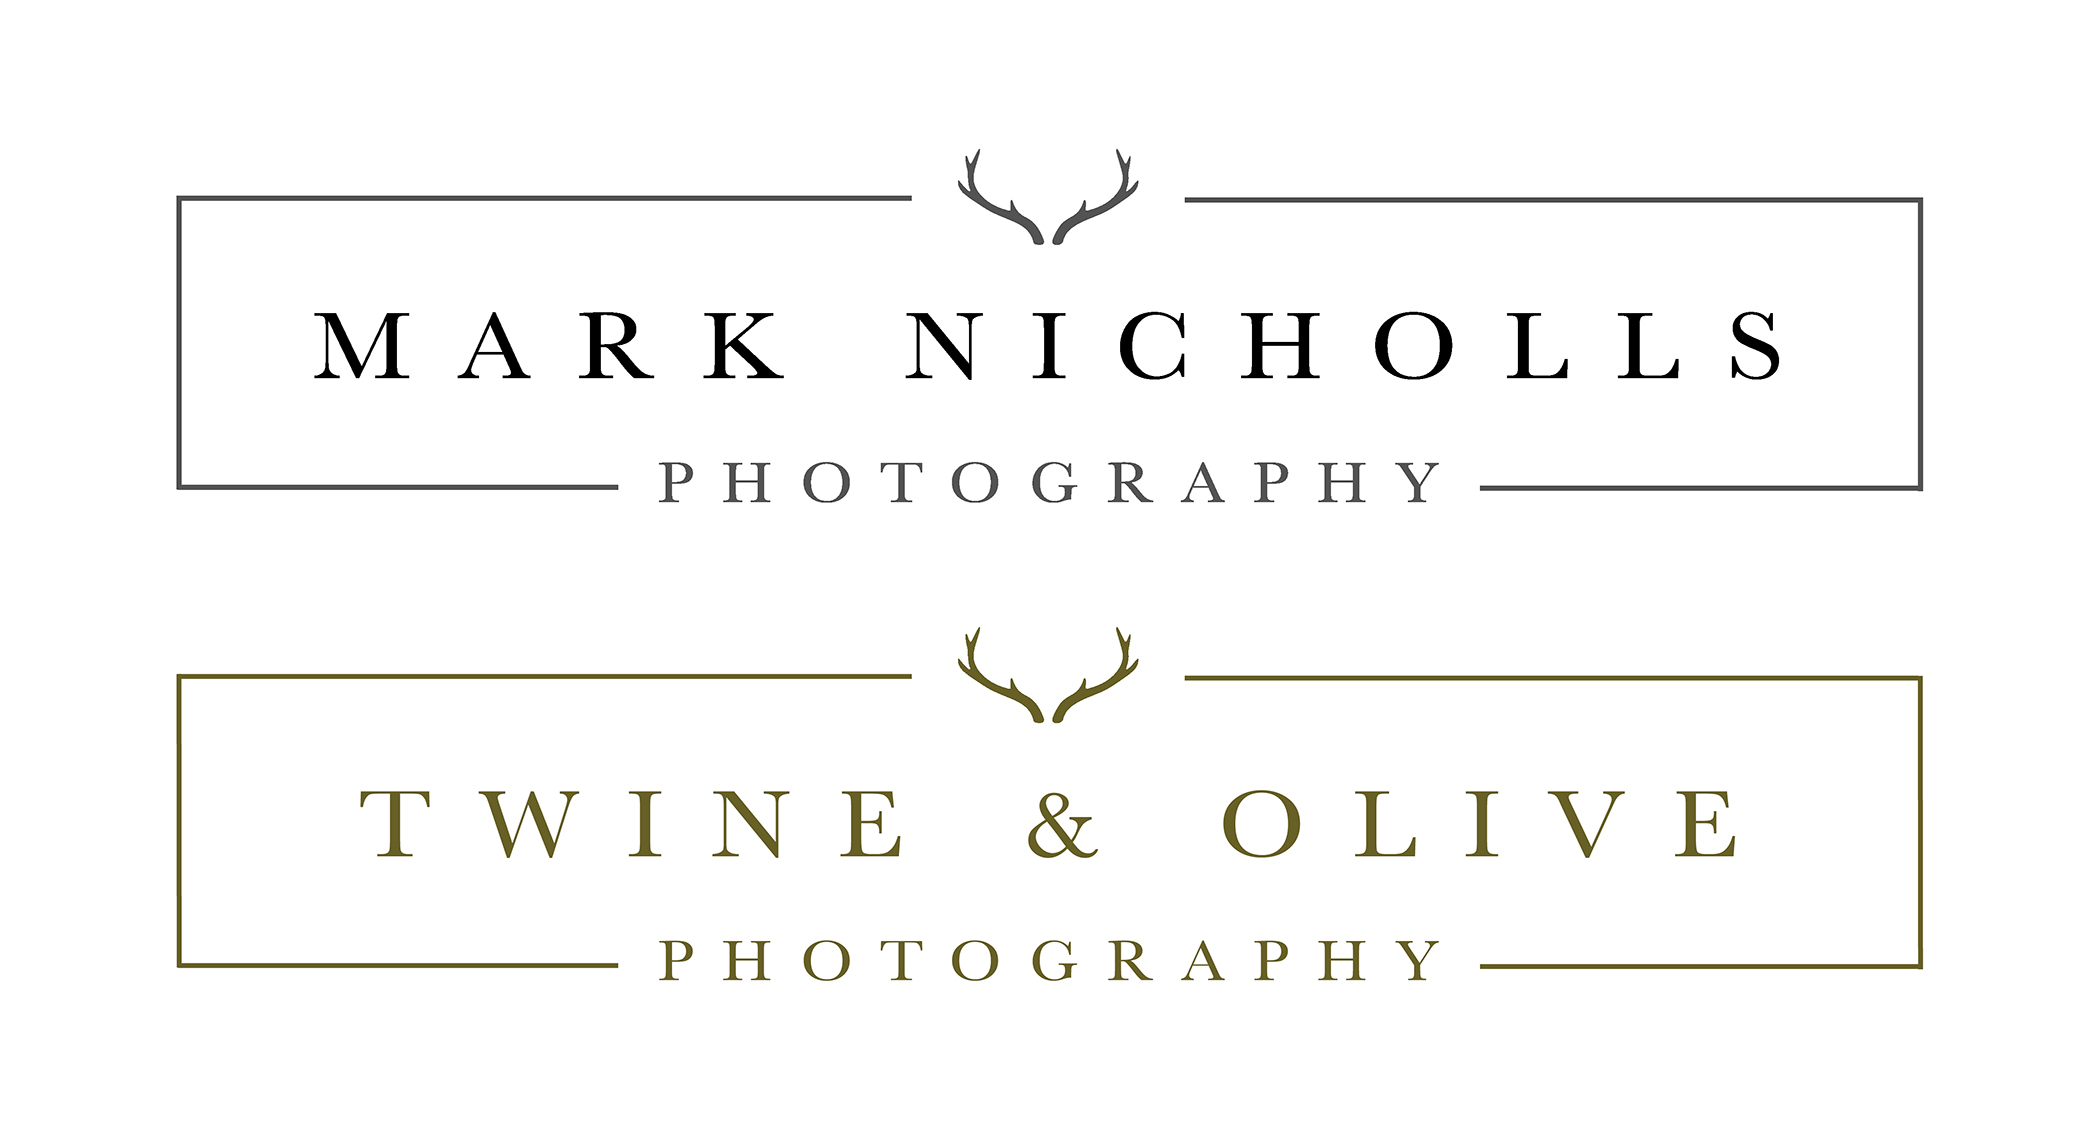 Mark Nicholls Photography